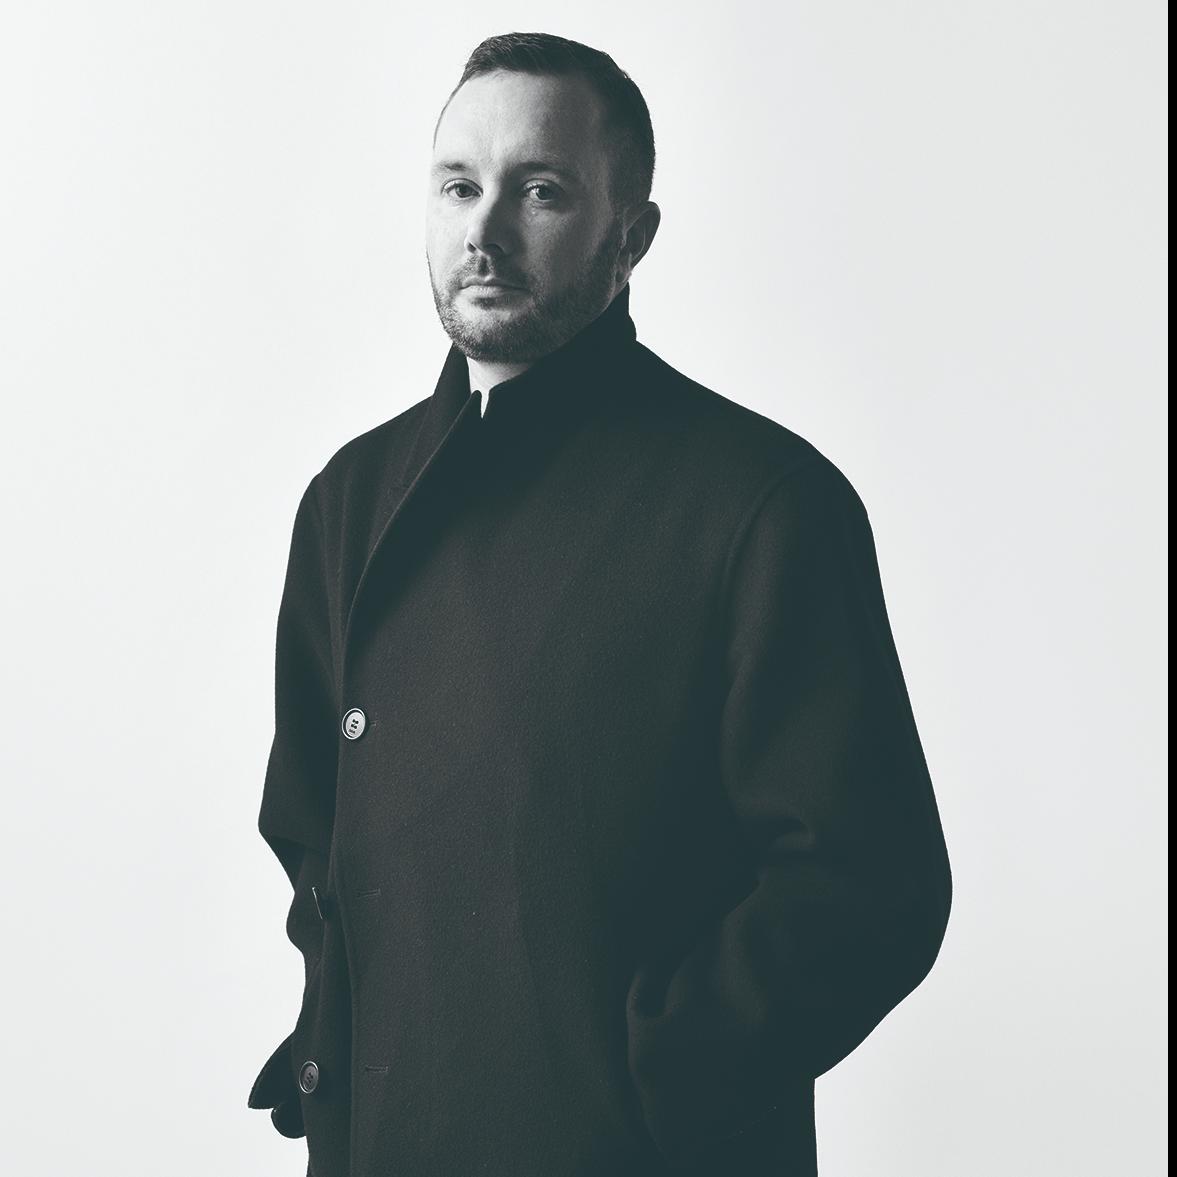 獨家專訪 Dior男裝創意總監 Kim Jones